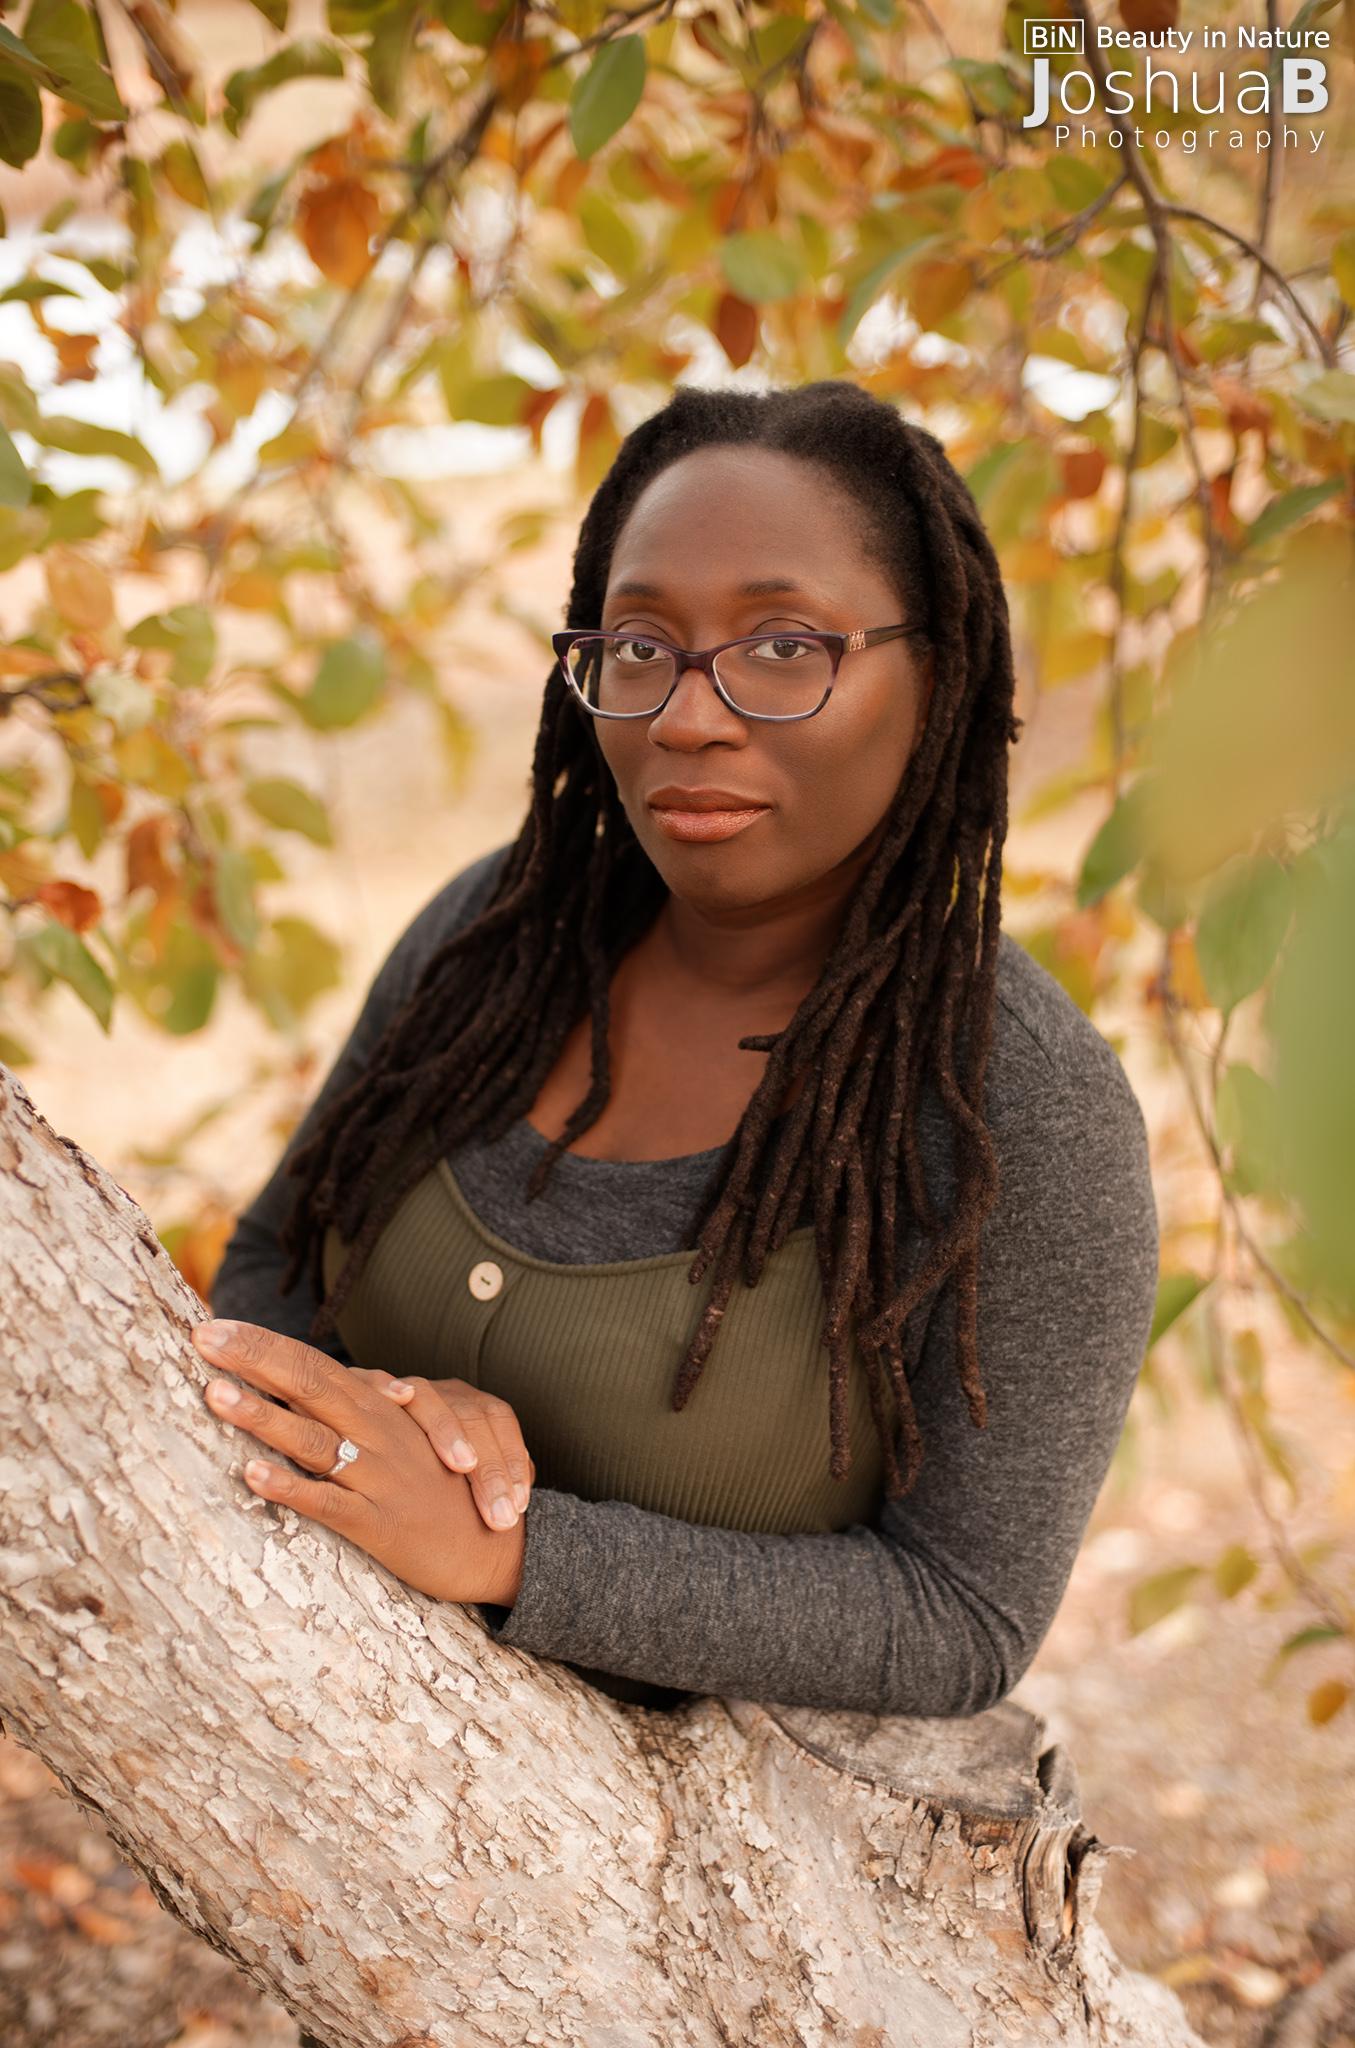 Black woman with dreadlocks under apple tree